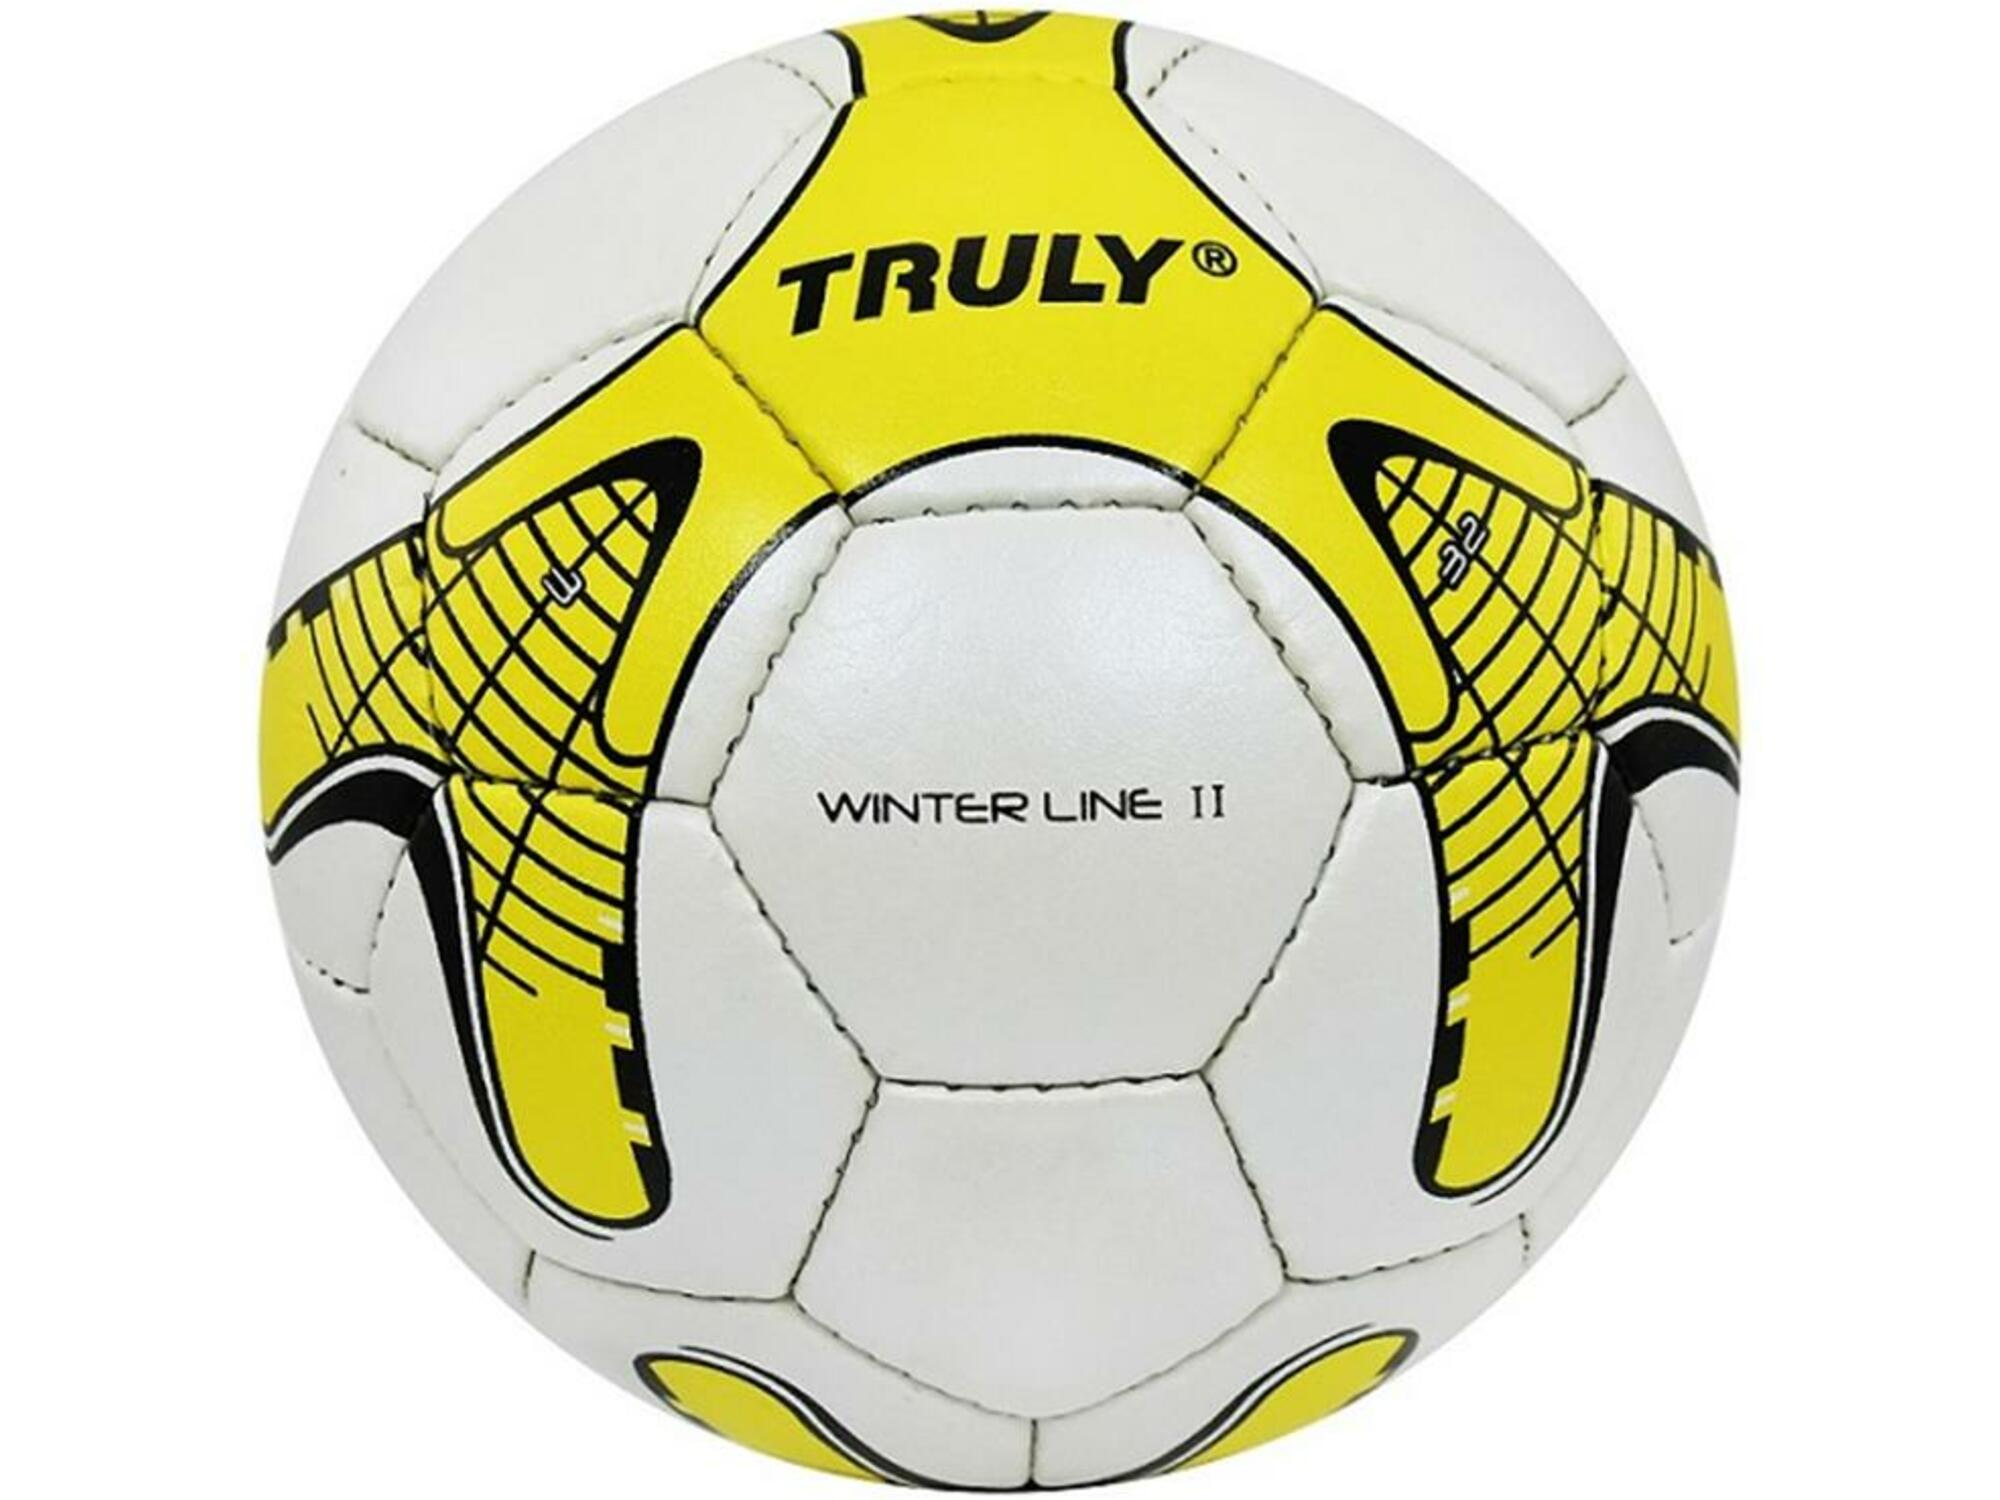 RULYT nogometna žoga Truly WinterLine II RY-12518